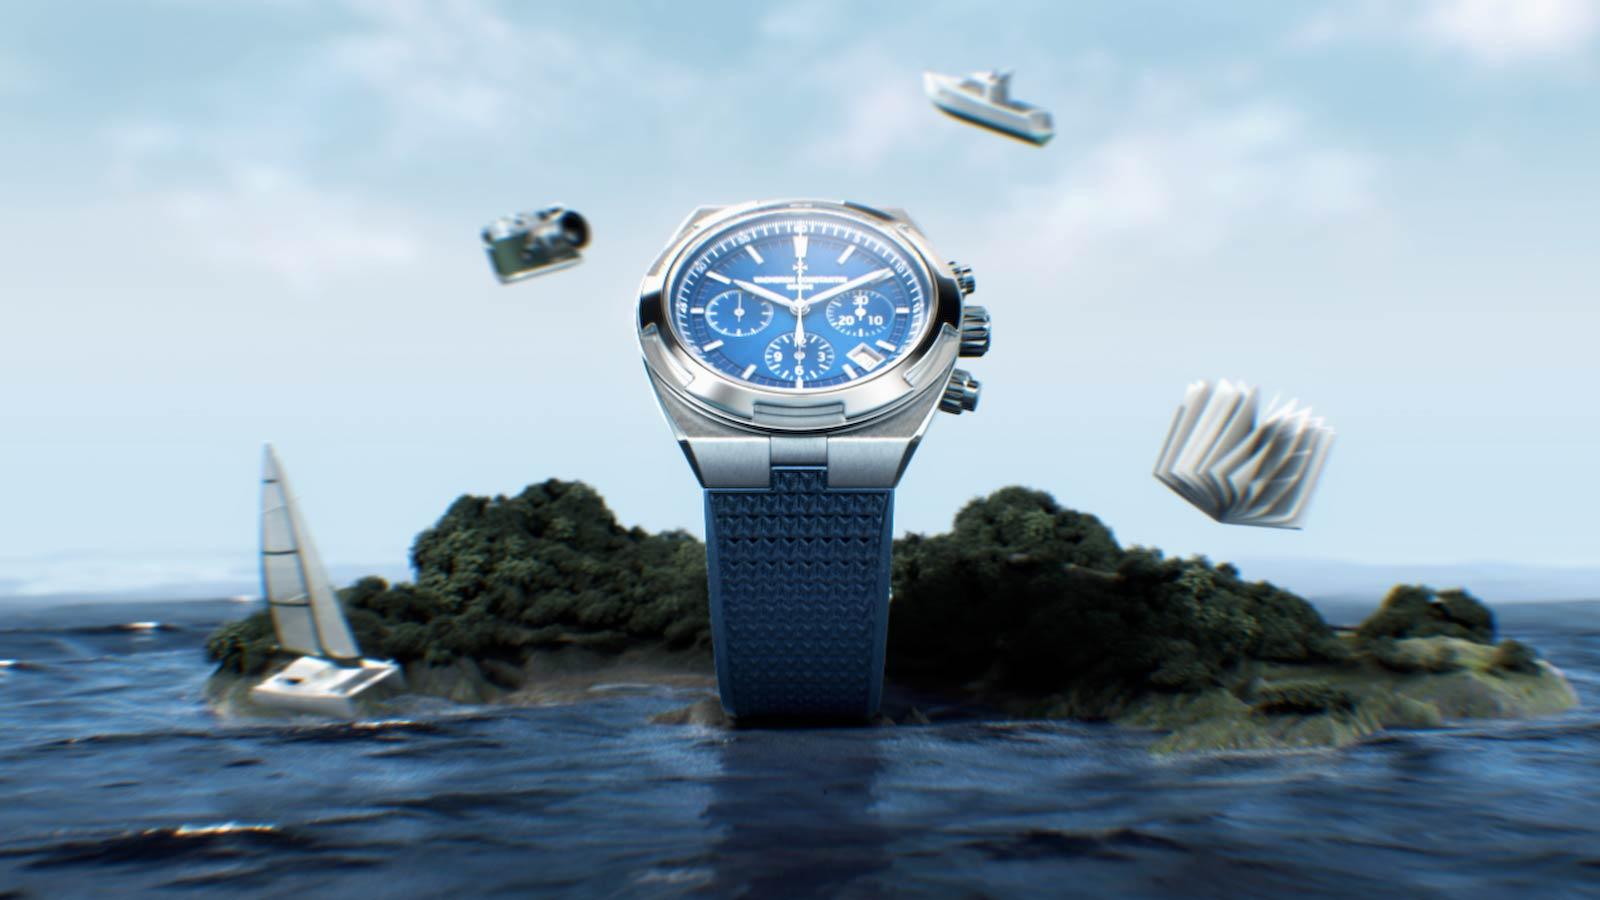 3D render of the Vacheron Overseas watch on a CGI island